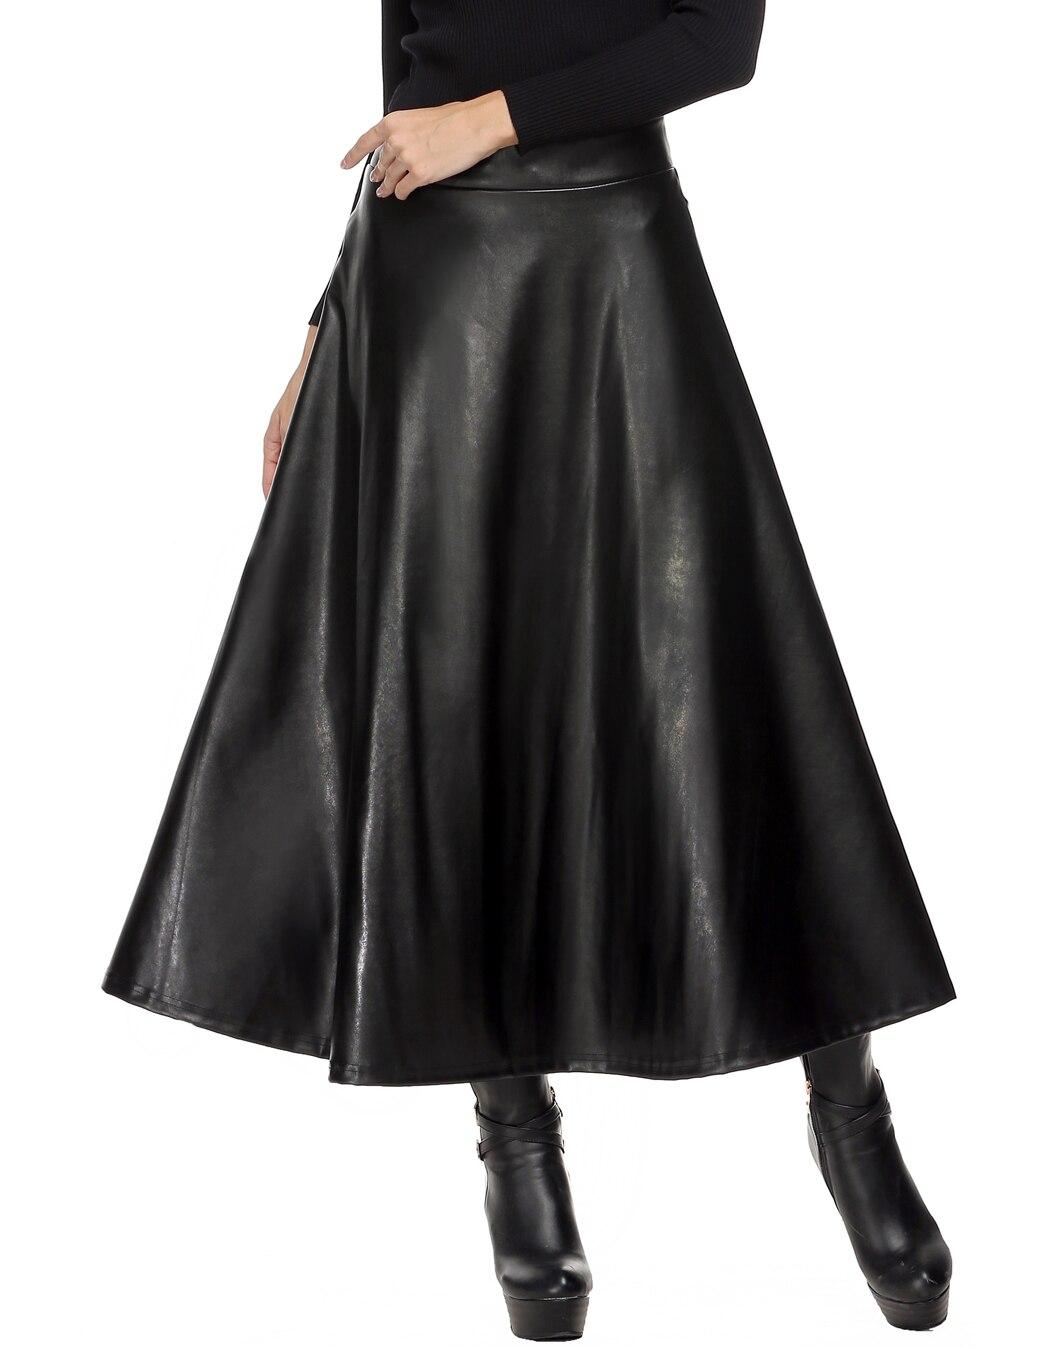 Winter Pu Leather Skirt Women Maxi Long Skirts Womens High Waist Slim Autumn Vintage Pleated Skirt Black Xl Xxl